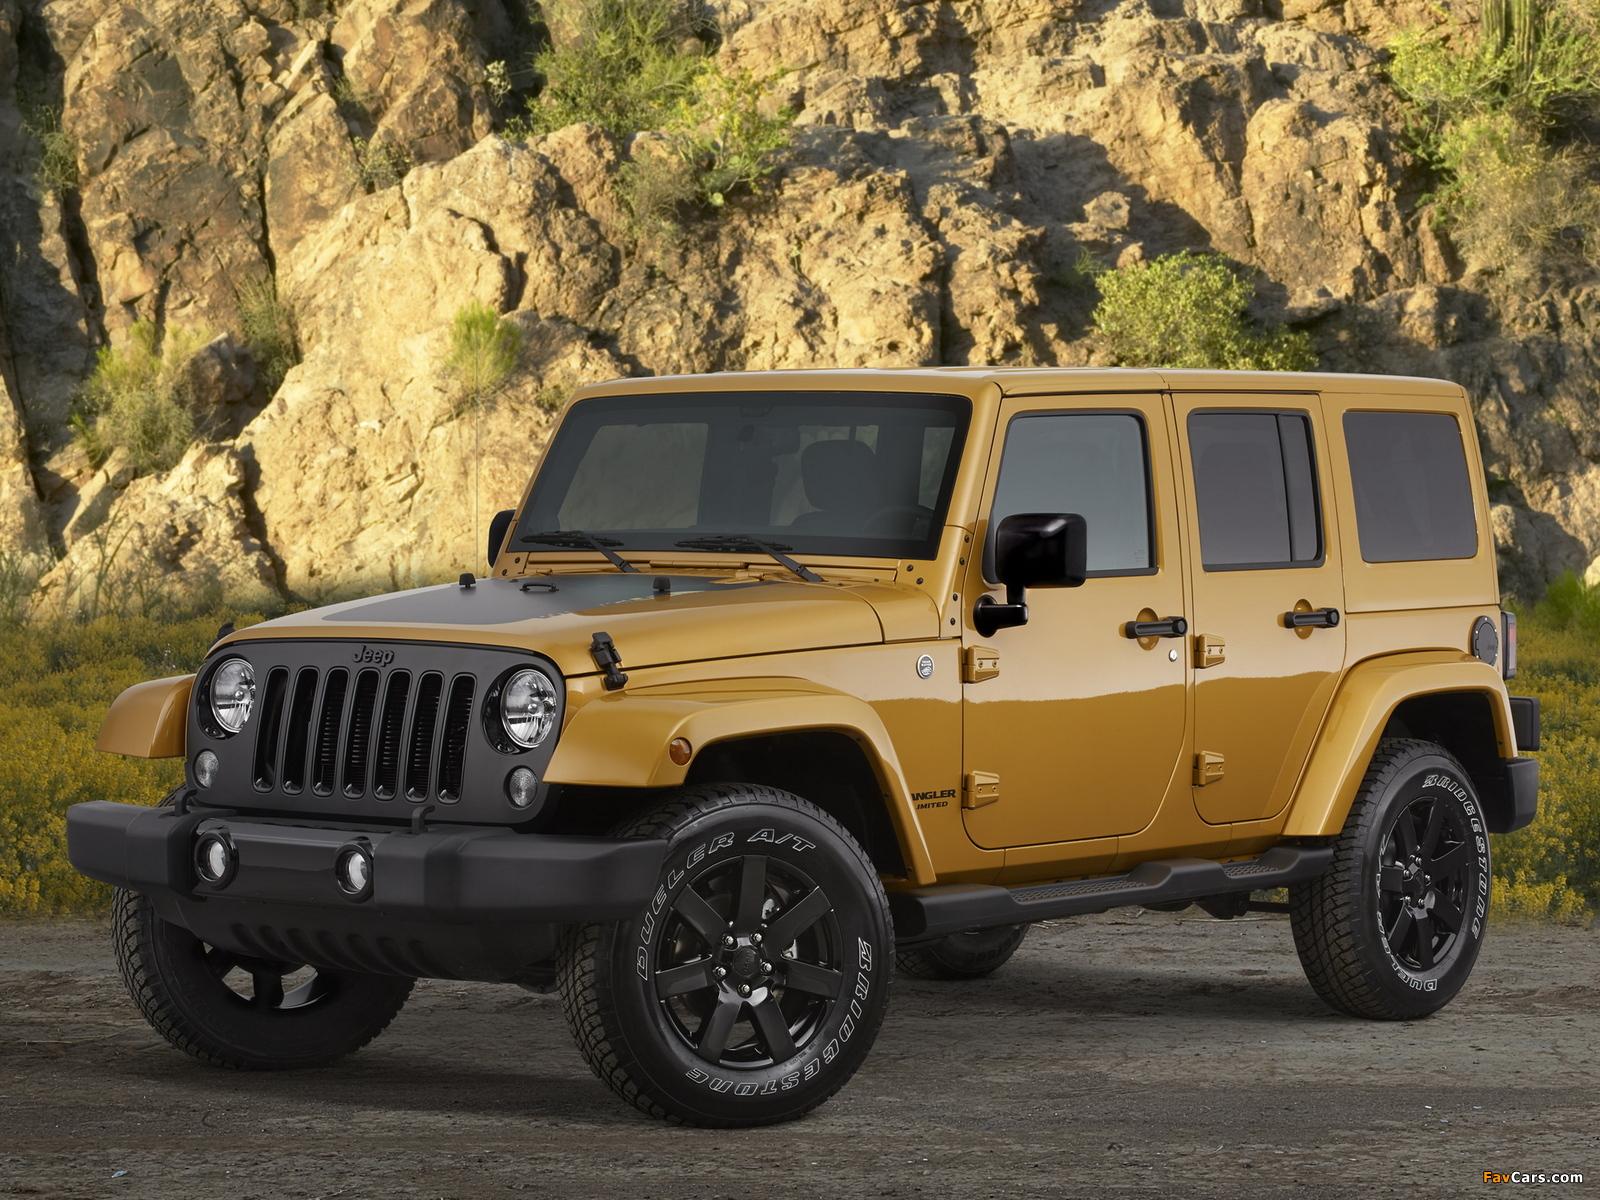 Jeep Wrangler Unlimited Altitude (JK) 2014 photos (1600 x 1200)